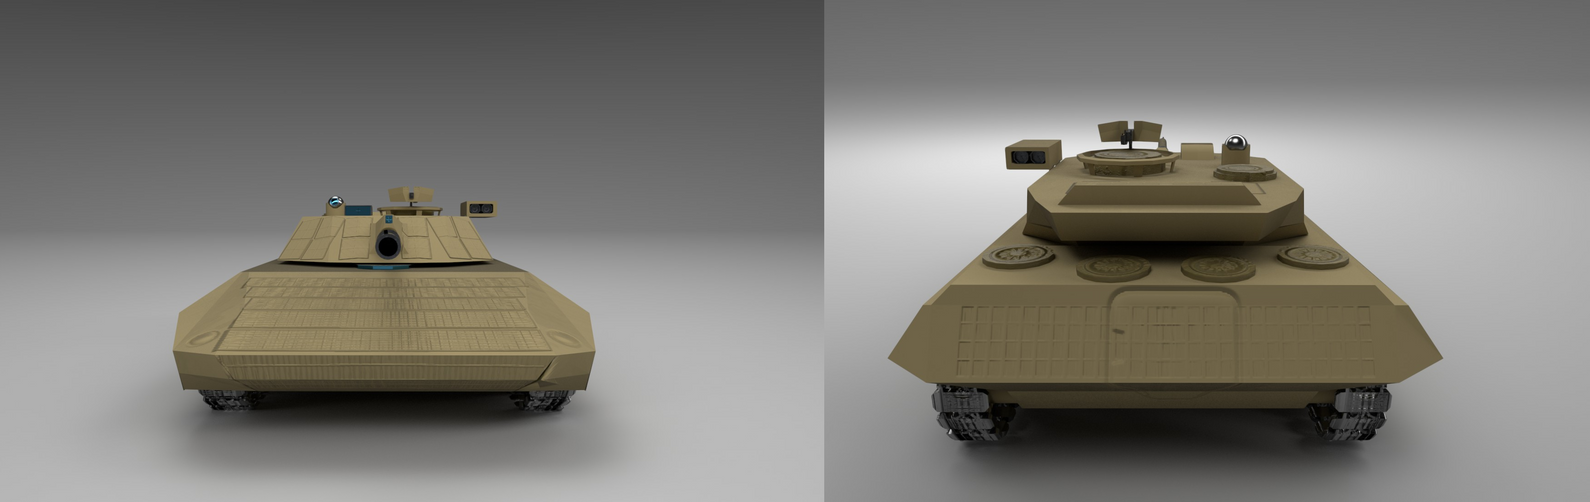 Tank Desert Paint 2 by planetrix15